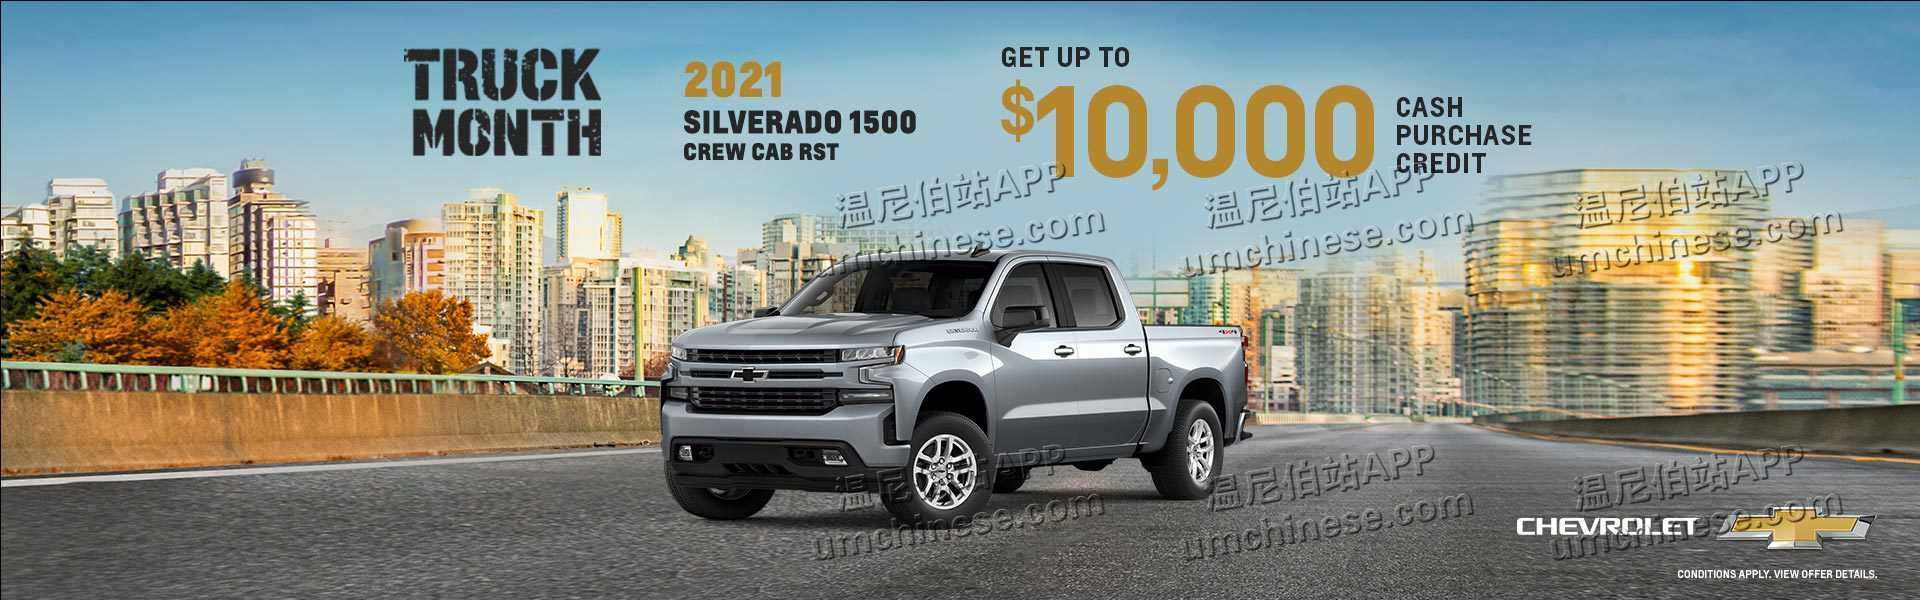 2021 truck month1.jpg